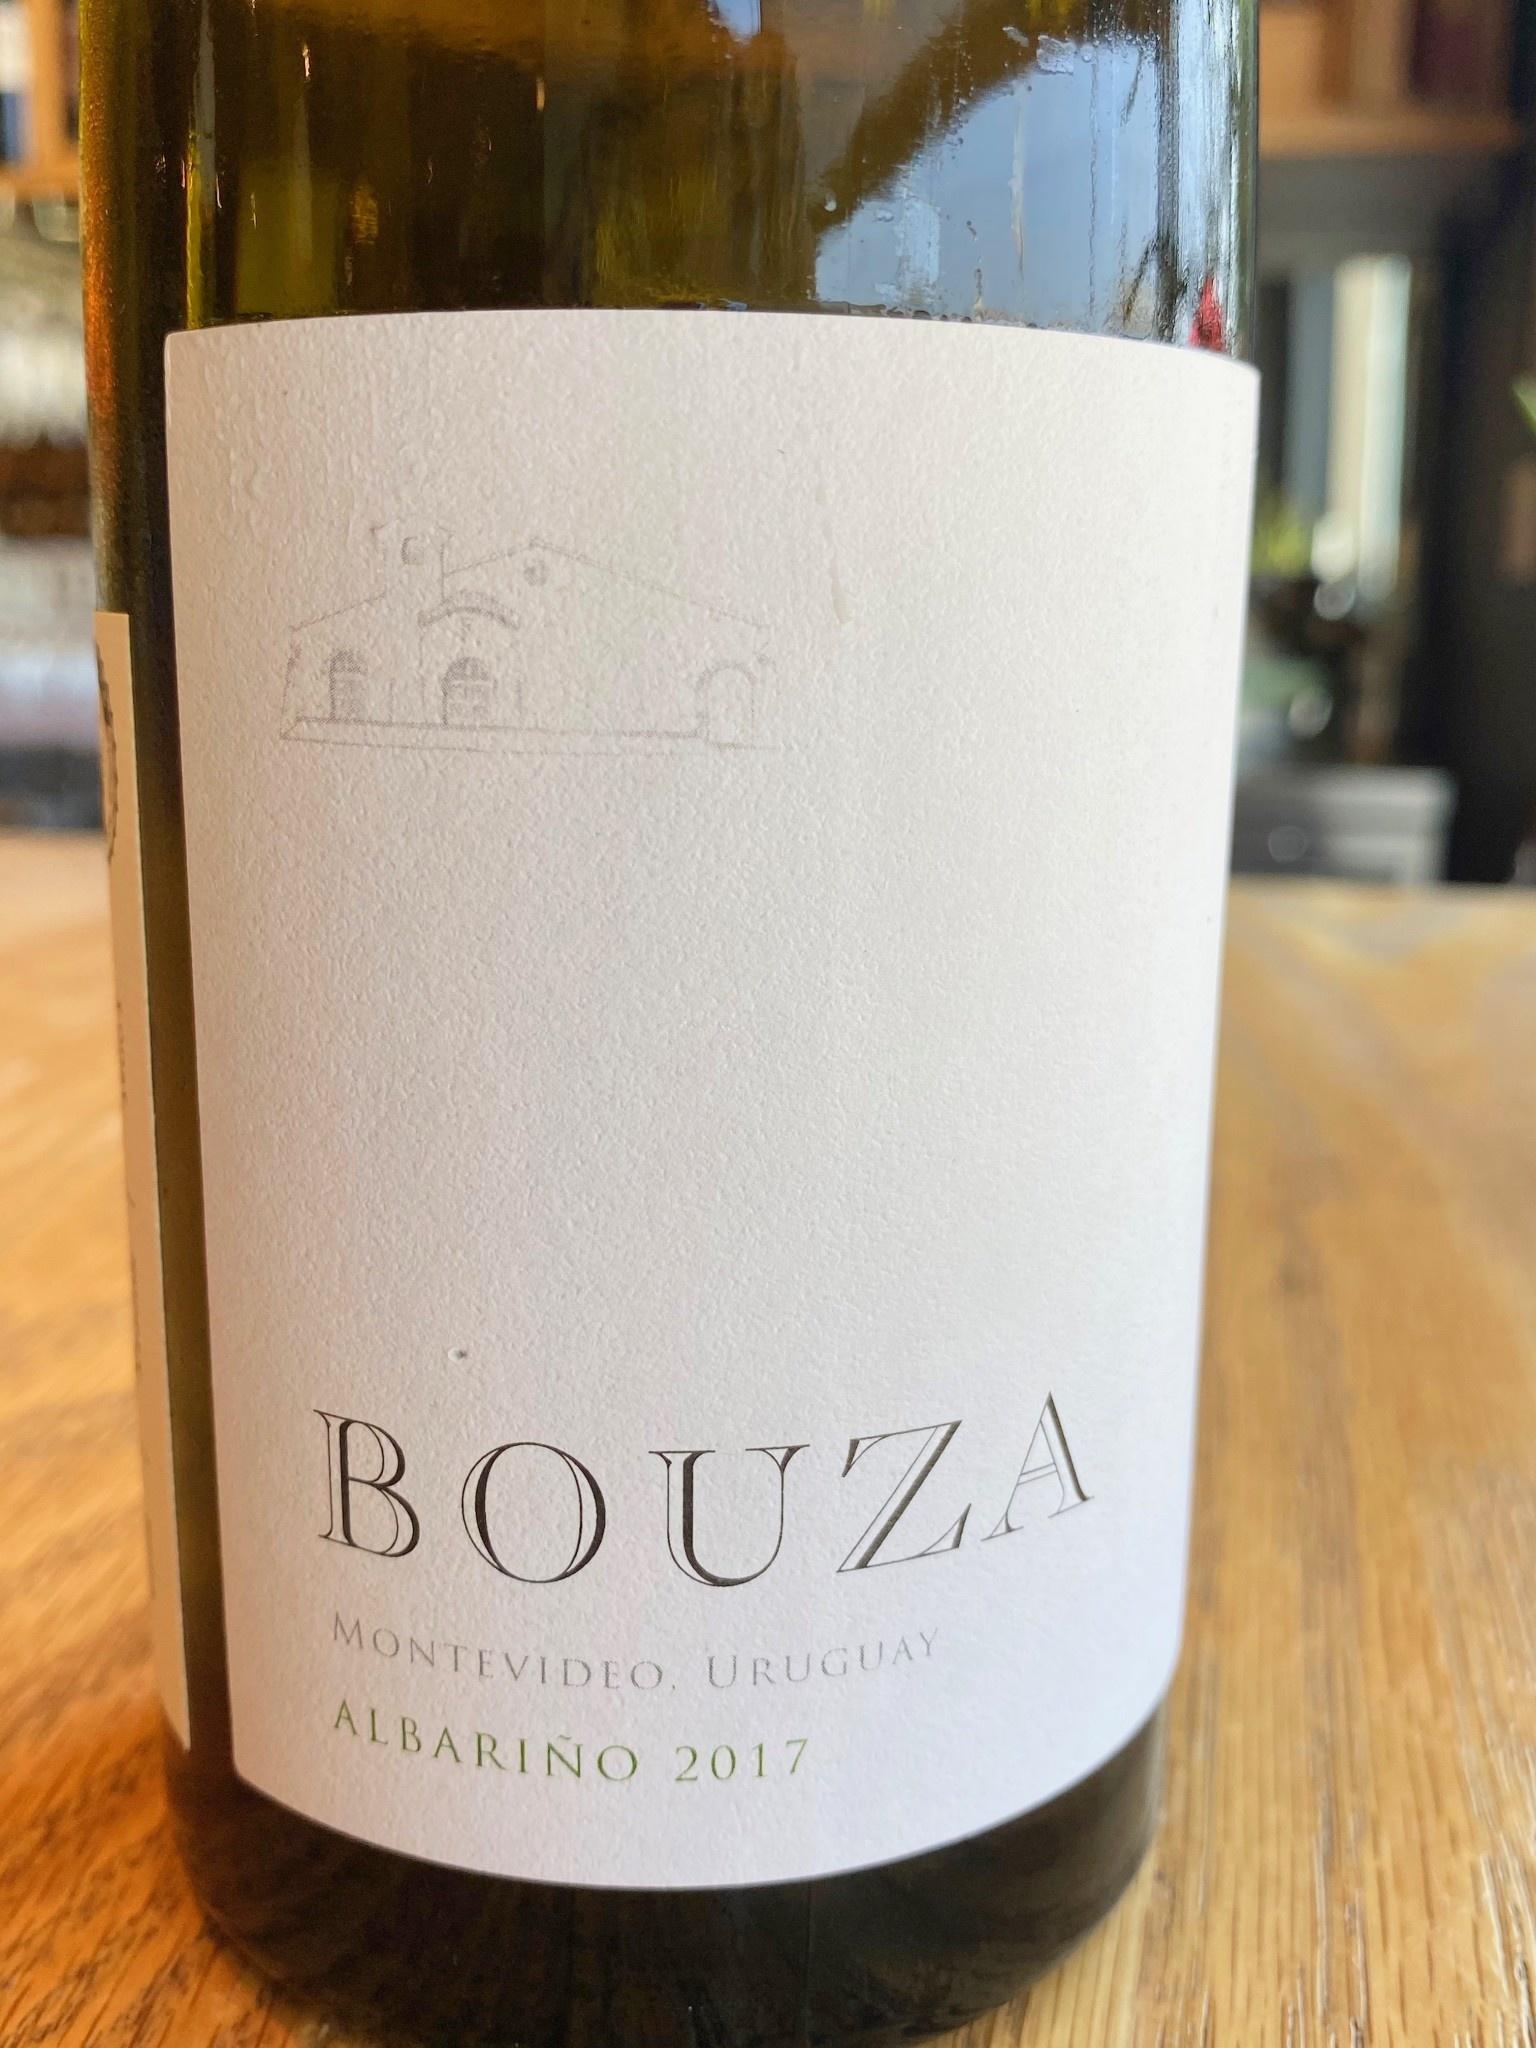 Bodega Bouza 2017 Bodega Bouza Albarino 750ml